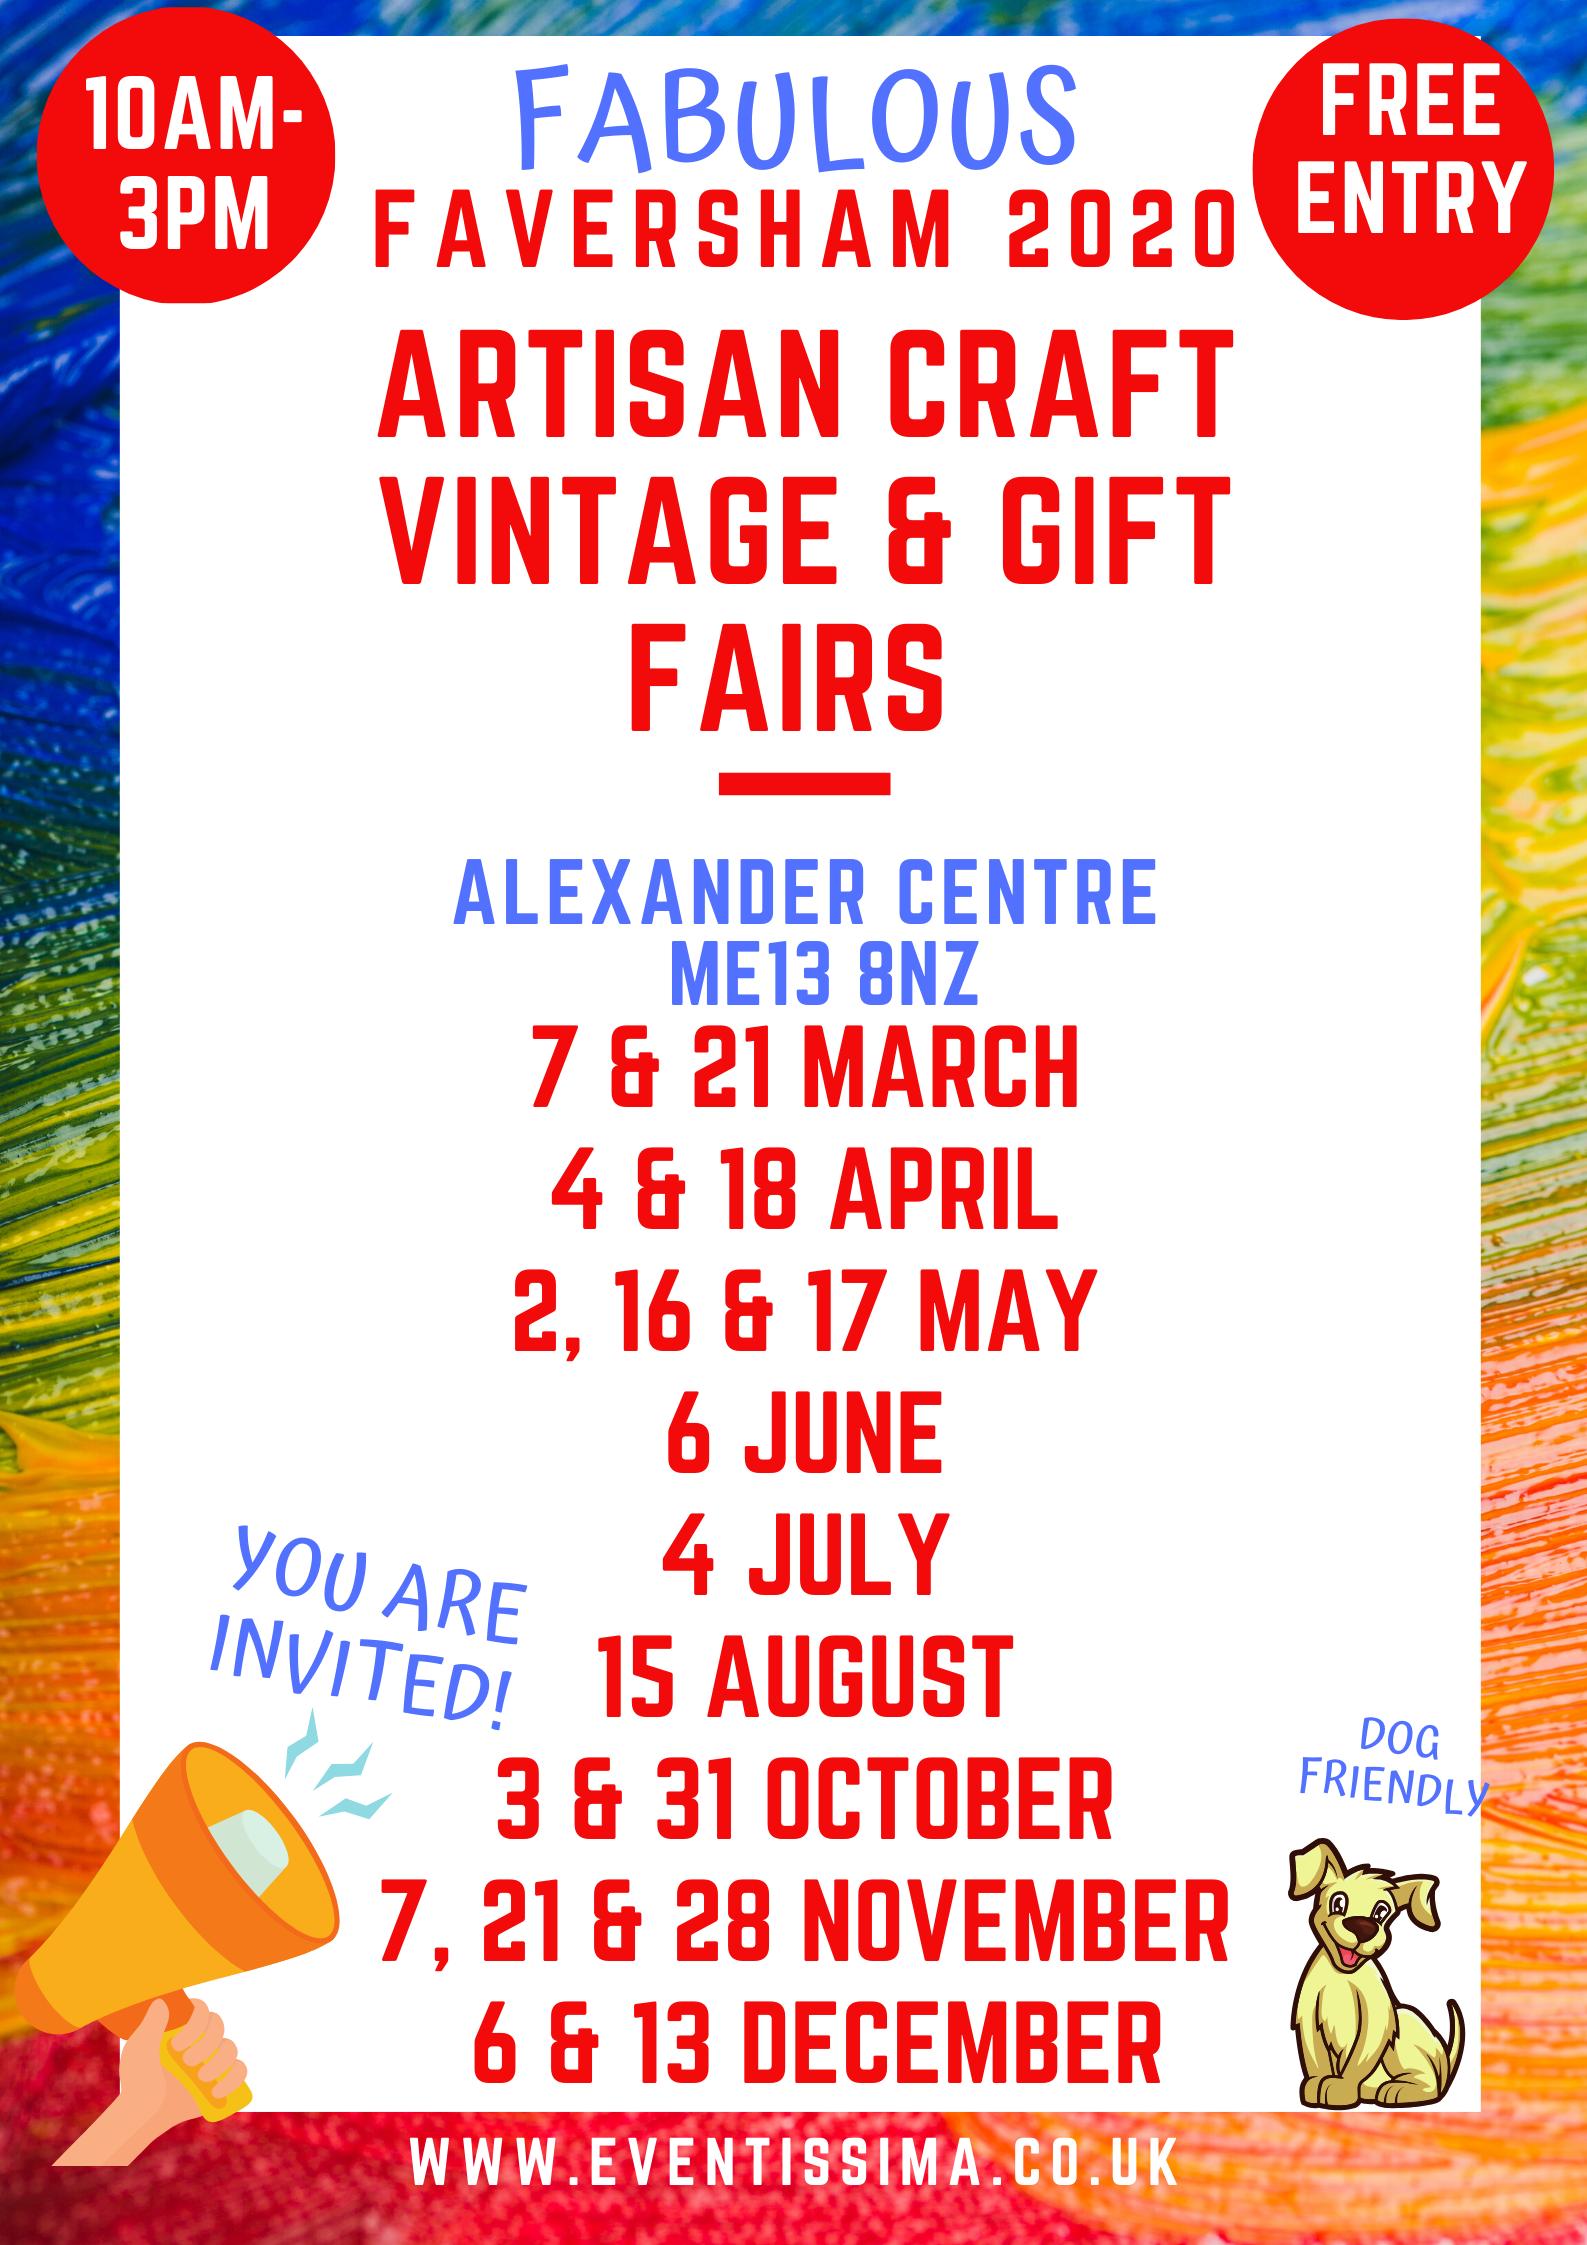 Faversham Artisan Crafts , Vintage and Gifts Fair